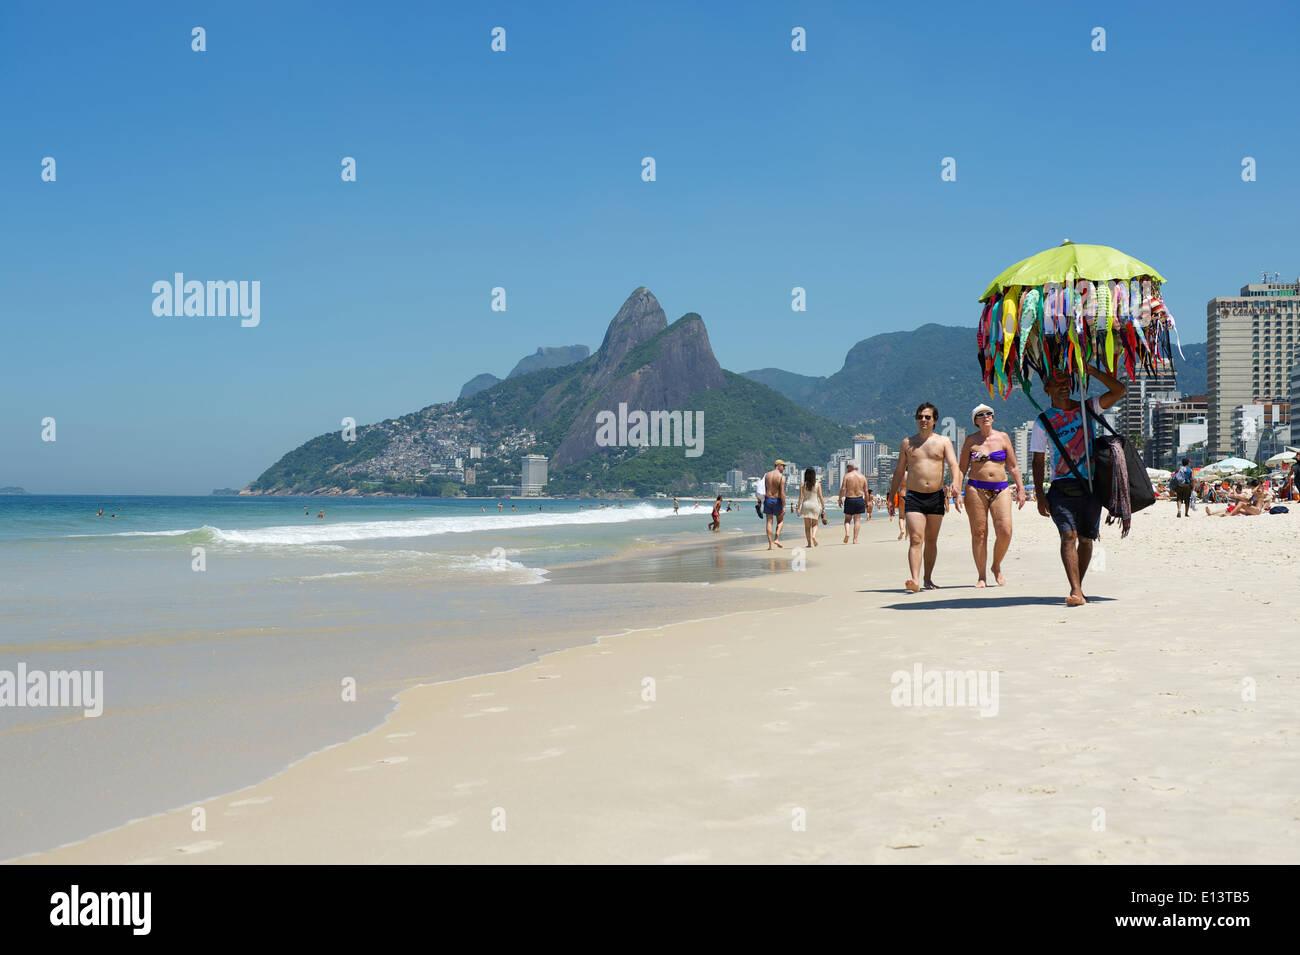 RIO DE JANEIRO, BRAZIL - MARCH, 2013: Beach vendor selling bikinis walks past morning beachgoers Ipanema Beach Rio de Jane - Stock Image